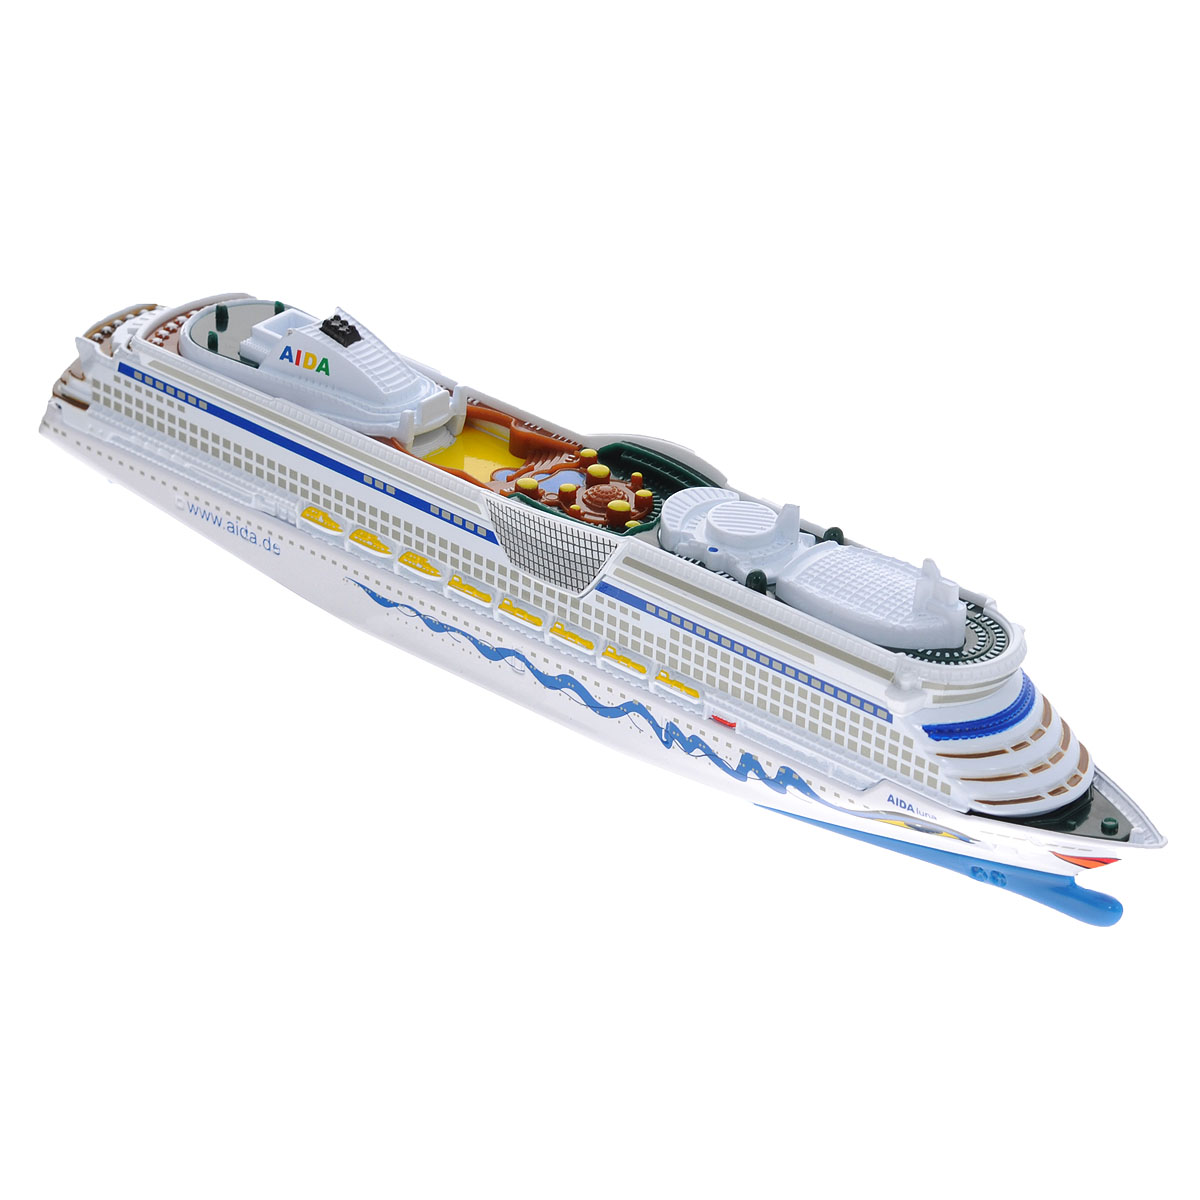 Siku Круизный лайнер AIDA Luna, Sieper GmbH